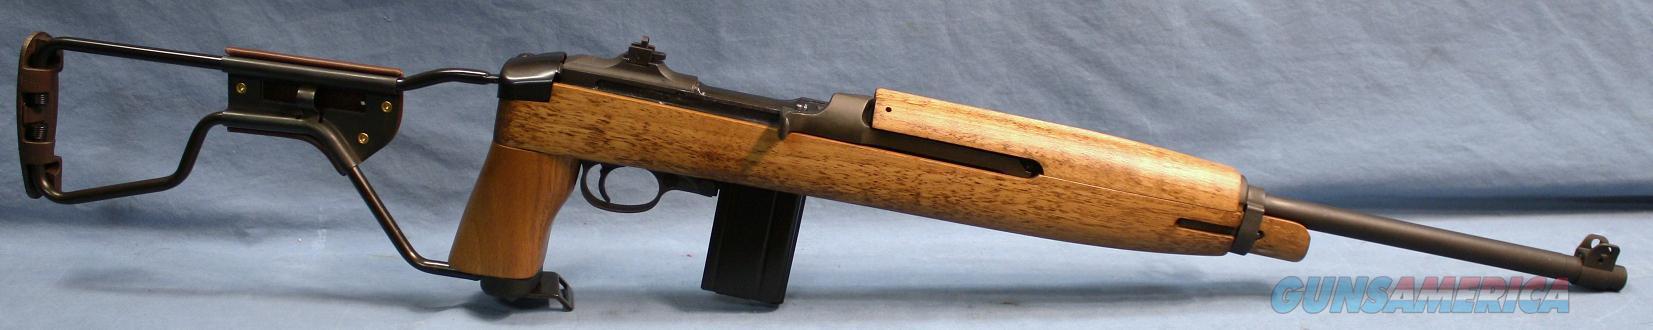 22598f81d762f3 Auto-Ordnance M1 Carbine Paratrooper Semi-Automatic Rifle .30 Carbine Guns    Rifles